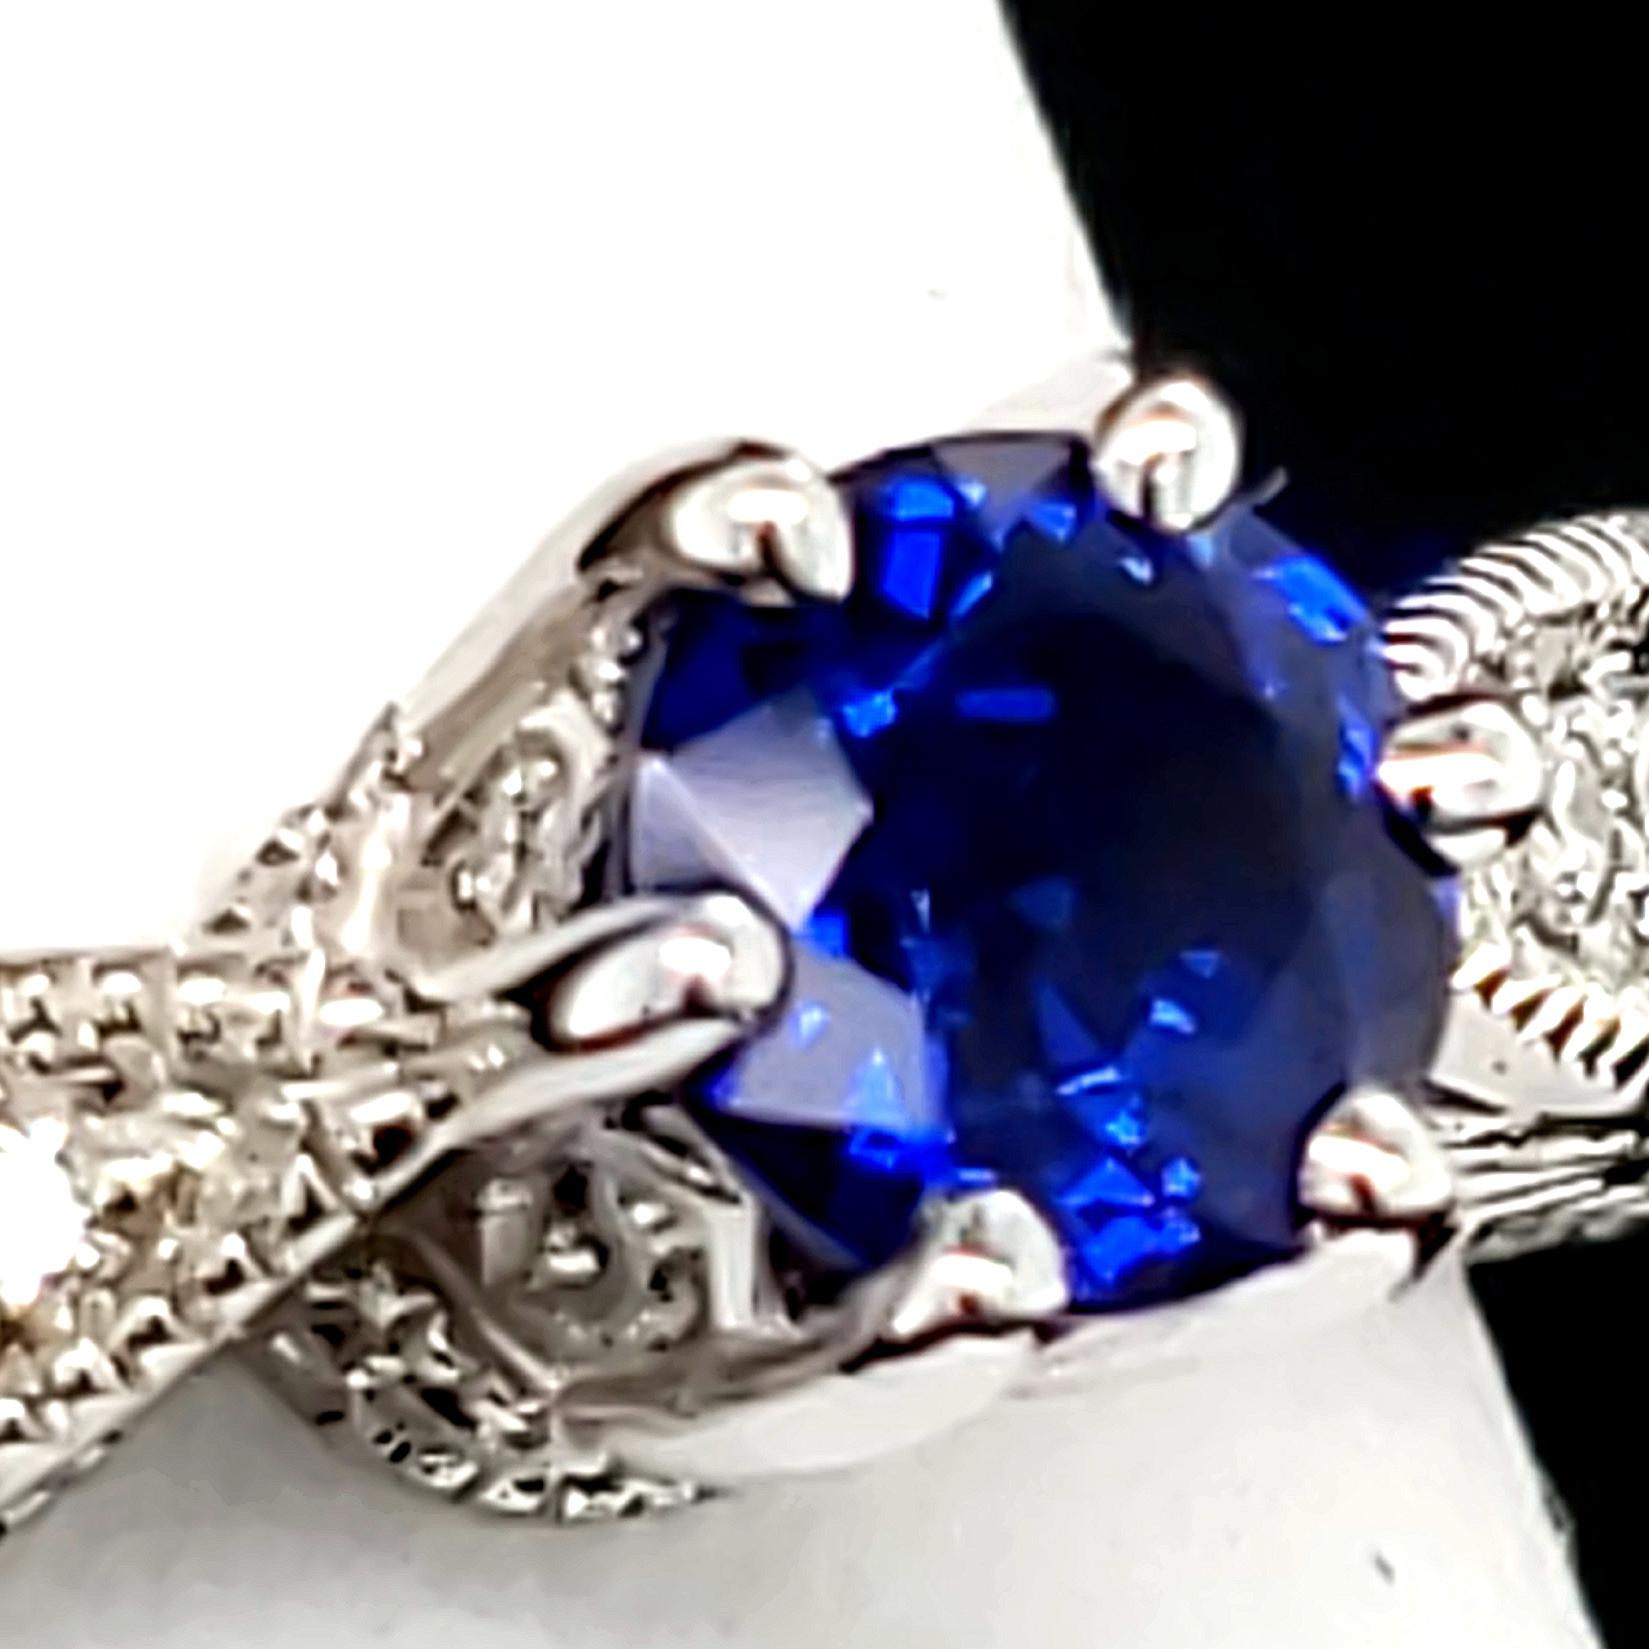 .62 ct. Blue Sapphire 14k wg RIng